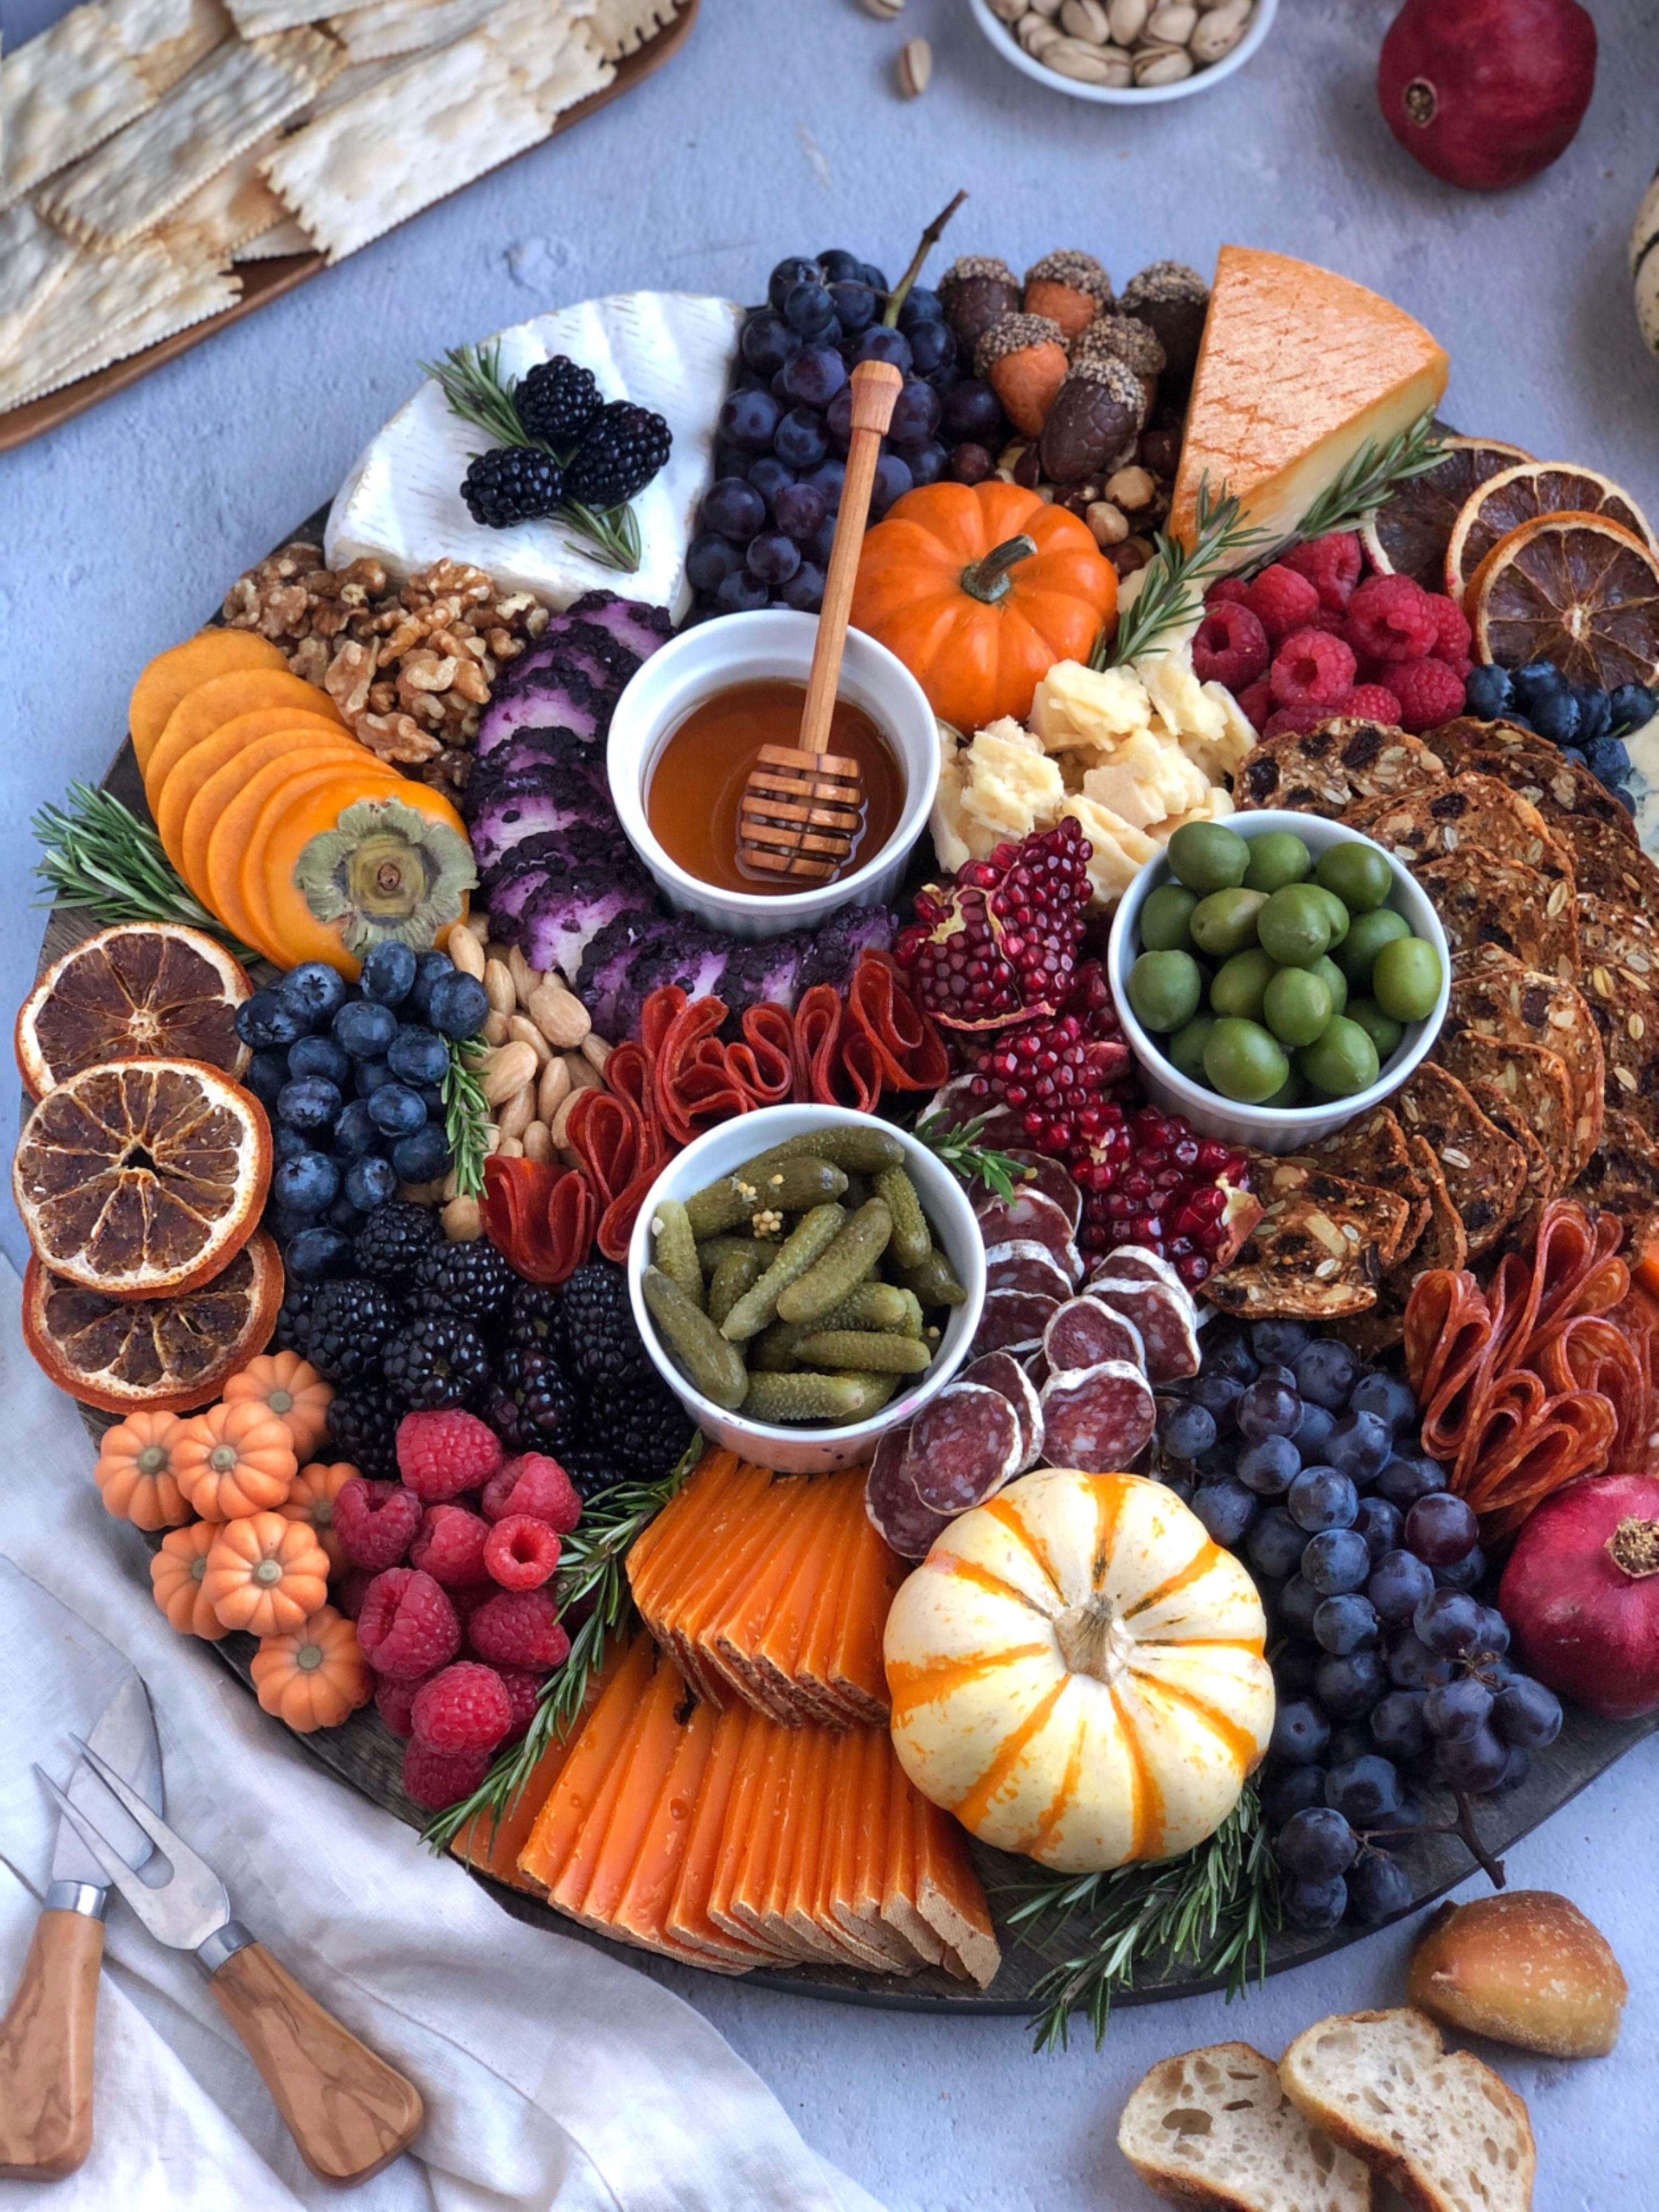 Mango Wood Board Sur La Table In 2020 Food Vegan Appetizers Charcuterie Recipes